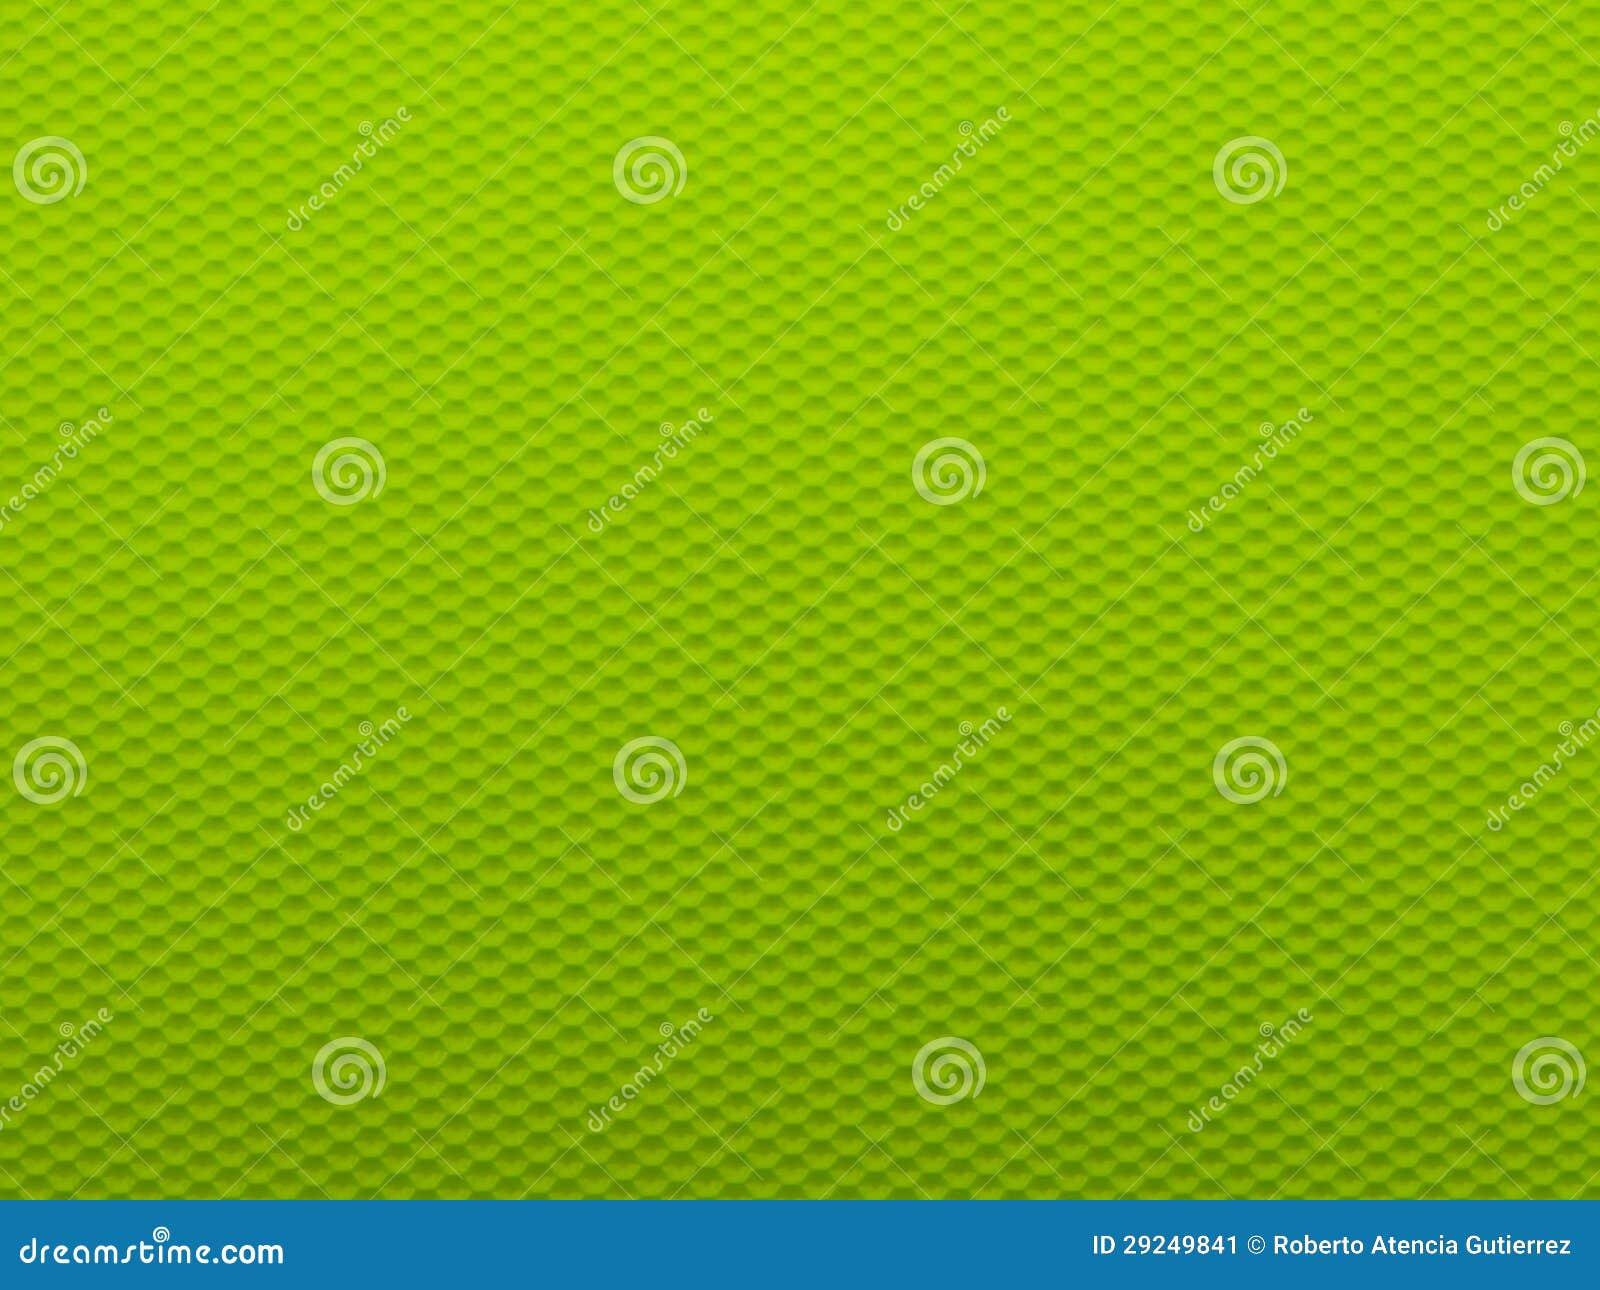 Download Geométrico abstrato verde imagem de stock. Imagem de bandeira - 29249841